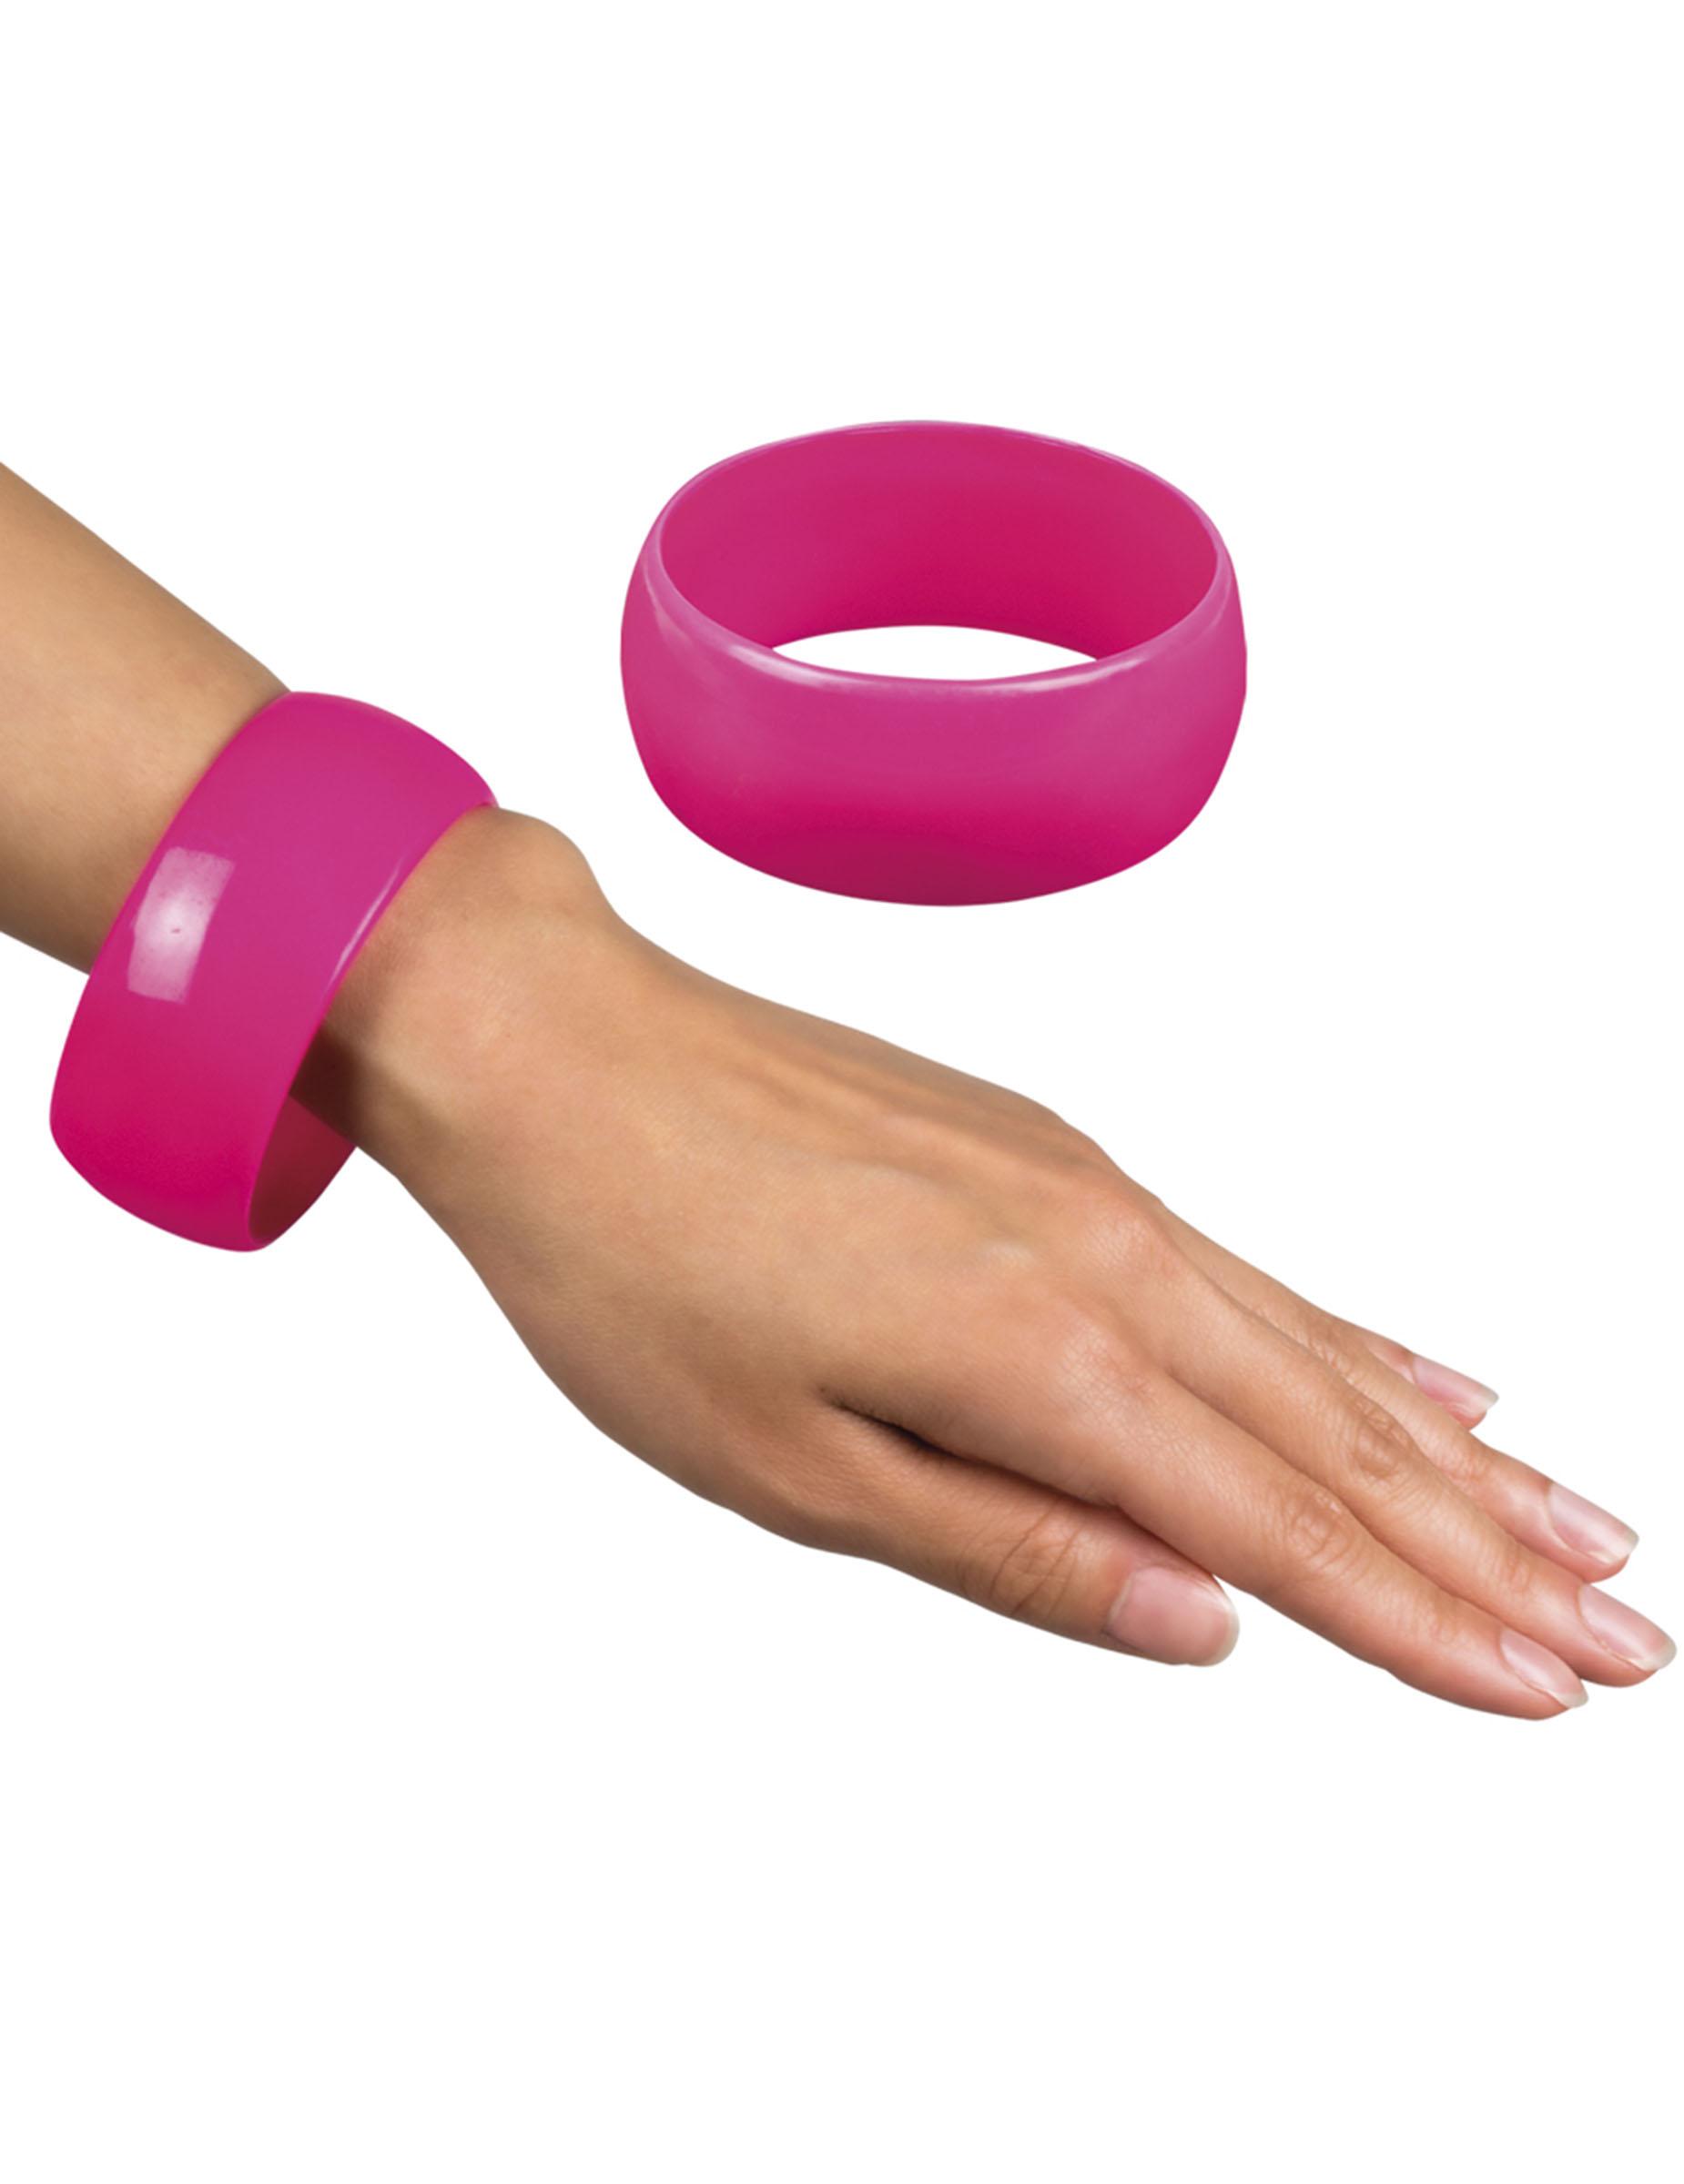 bracelet large rose femme deguise toi achat de accessoires. Black Bedroom Furniture Sets. Home Design Ideas